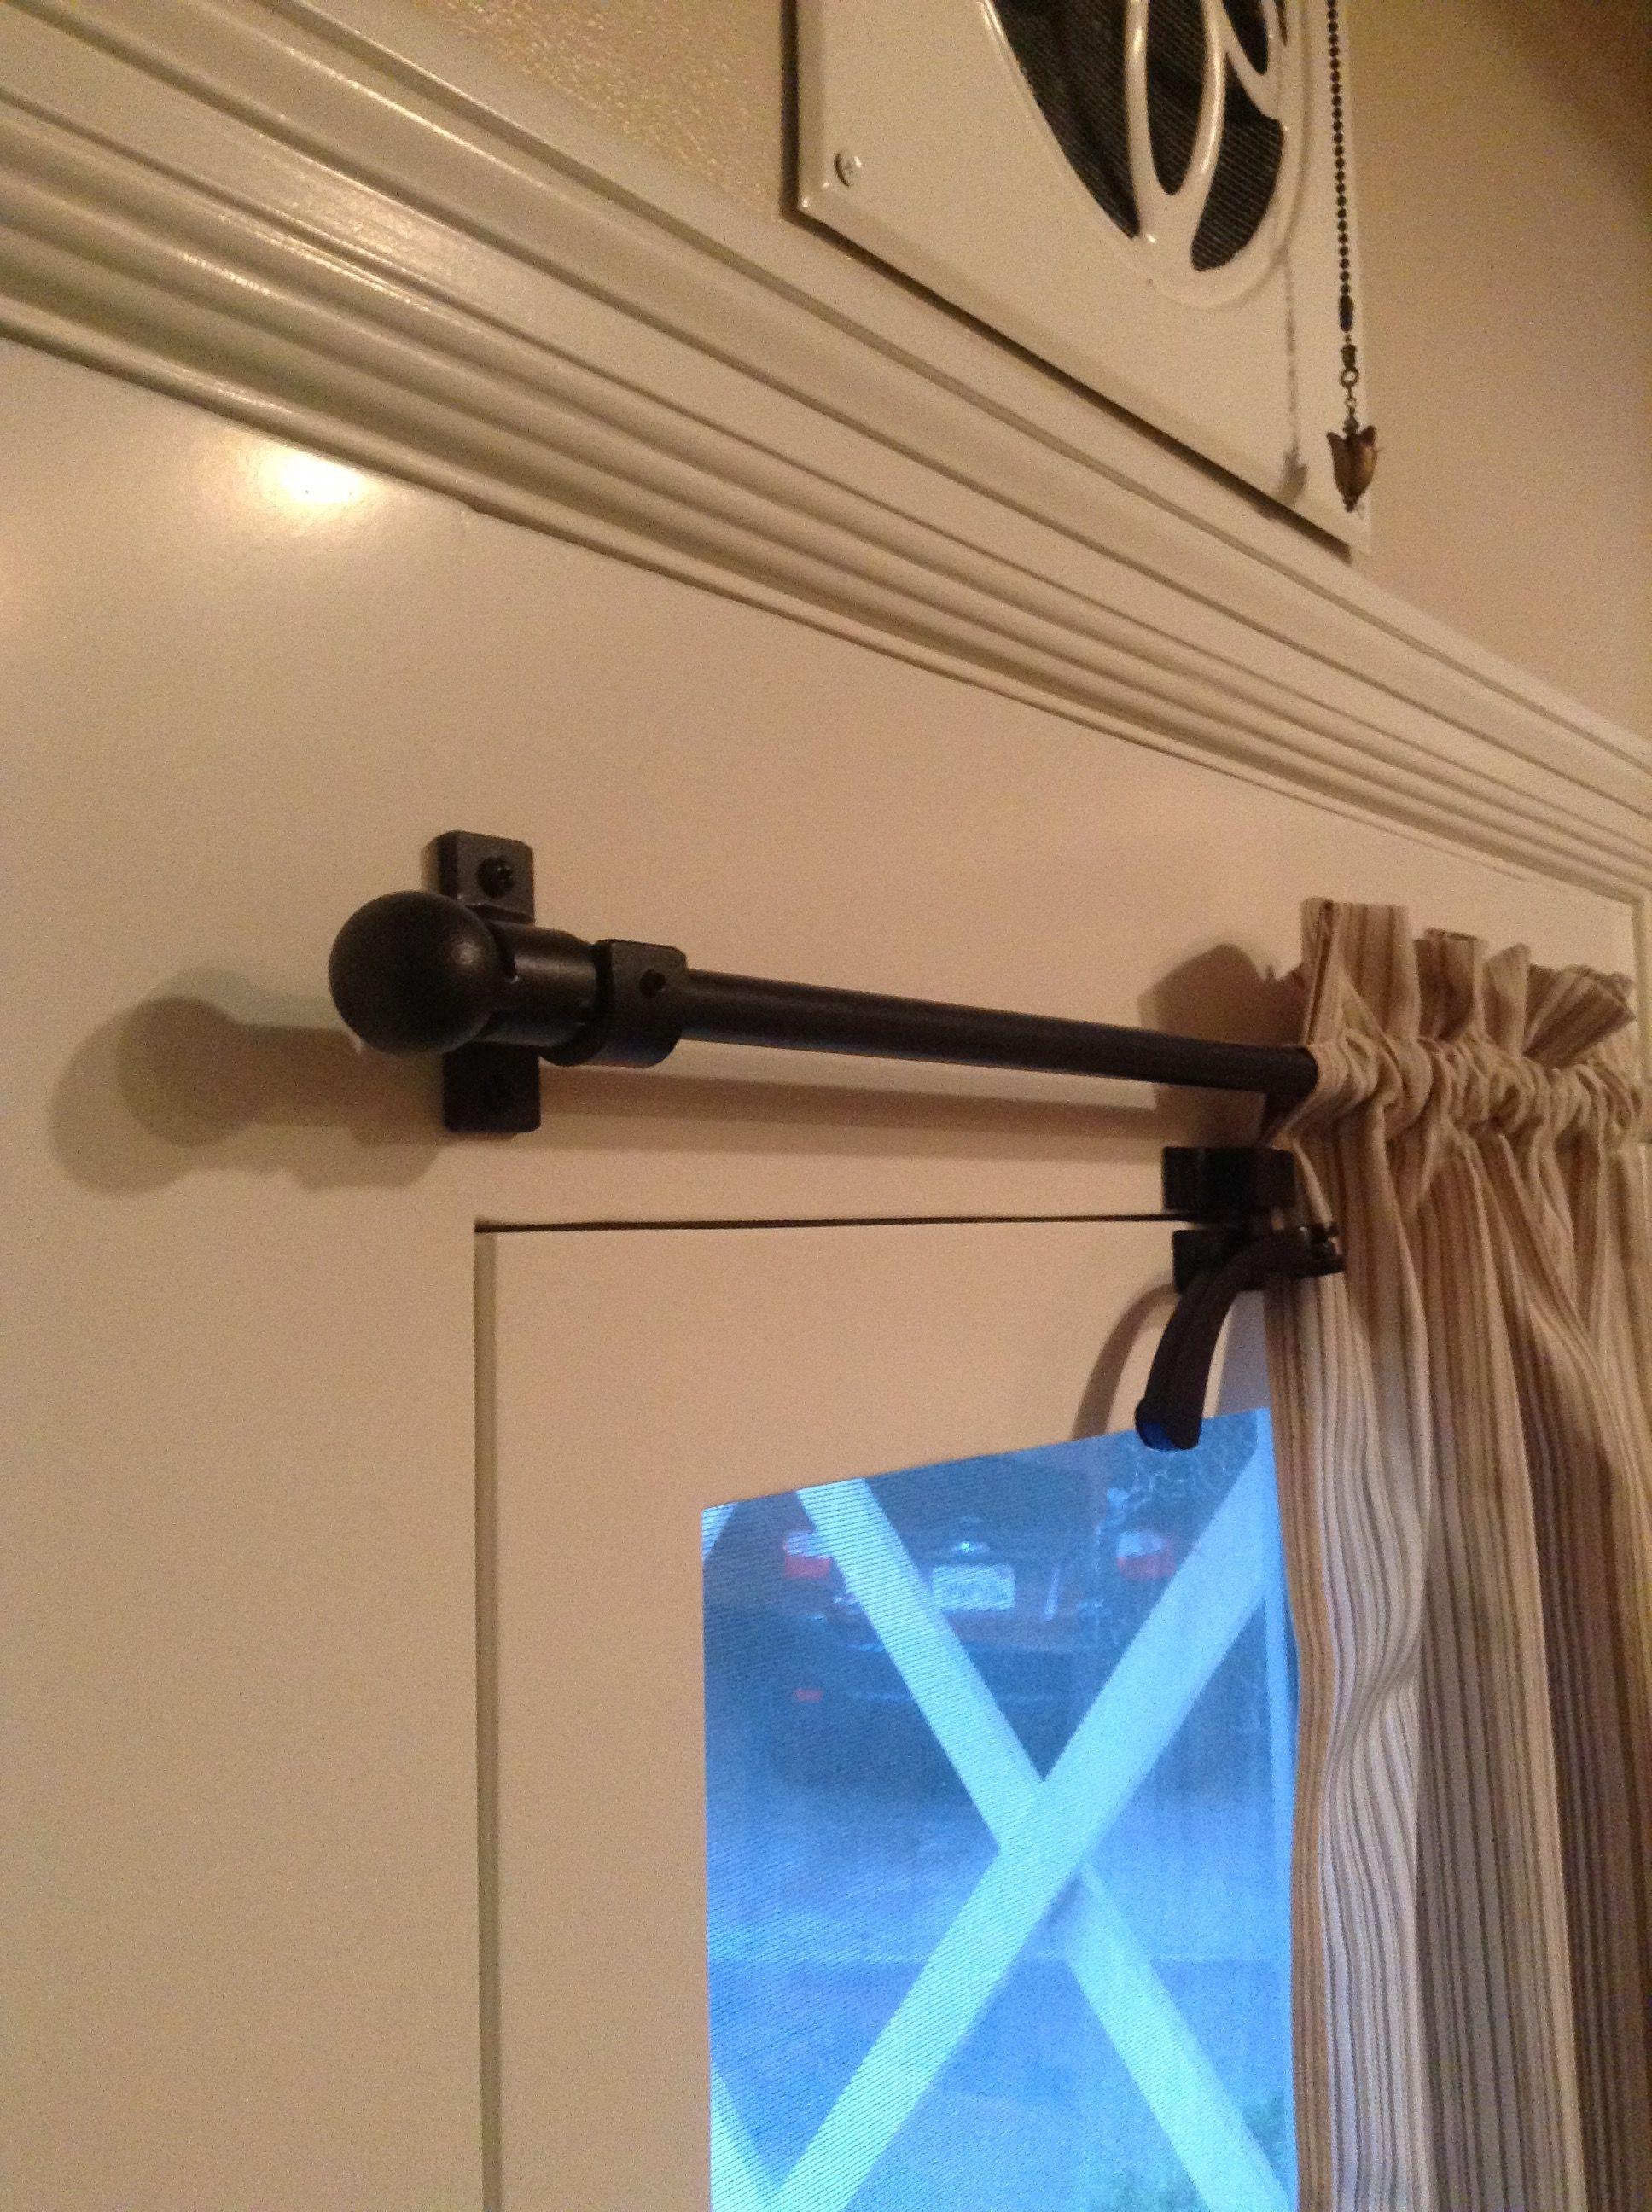 Small Iron Rod Door Curtain Rod Cafe Iron Rod With Ball Finials